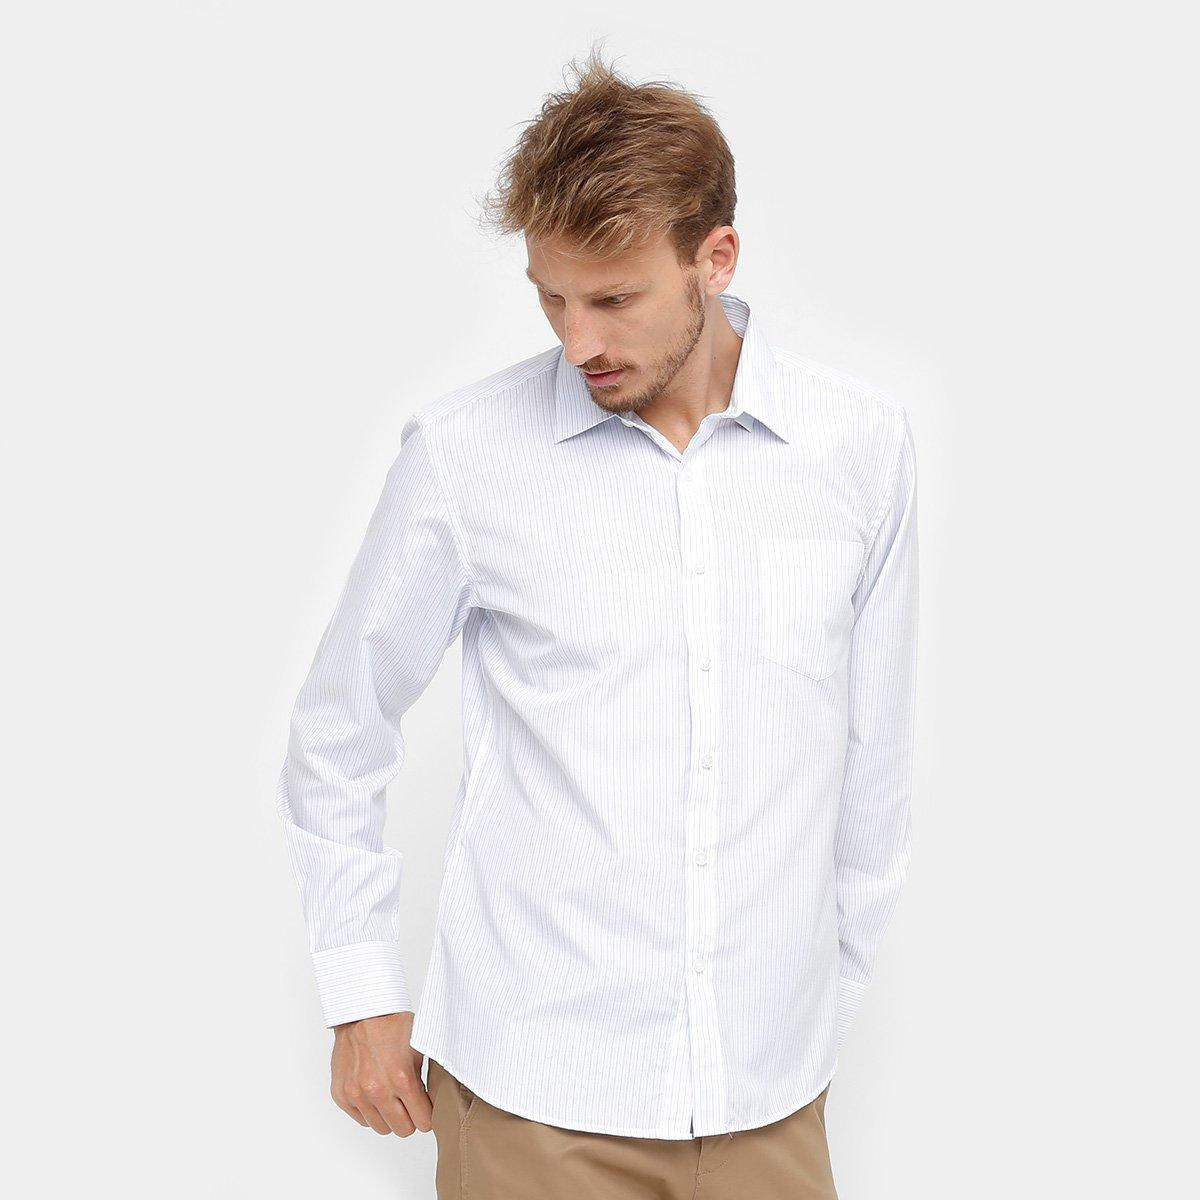 cbb288d55b Camisa Social Blue Bay Listras Bolso Masculina - Compre Agora